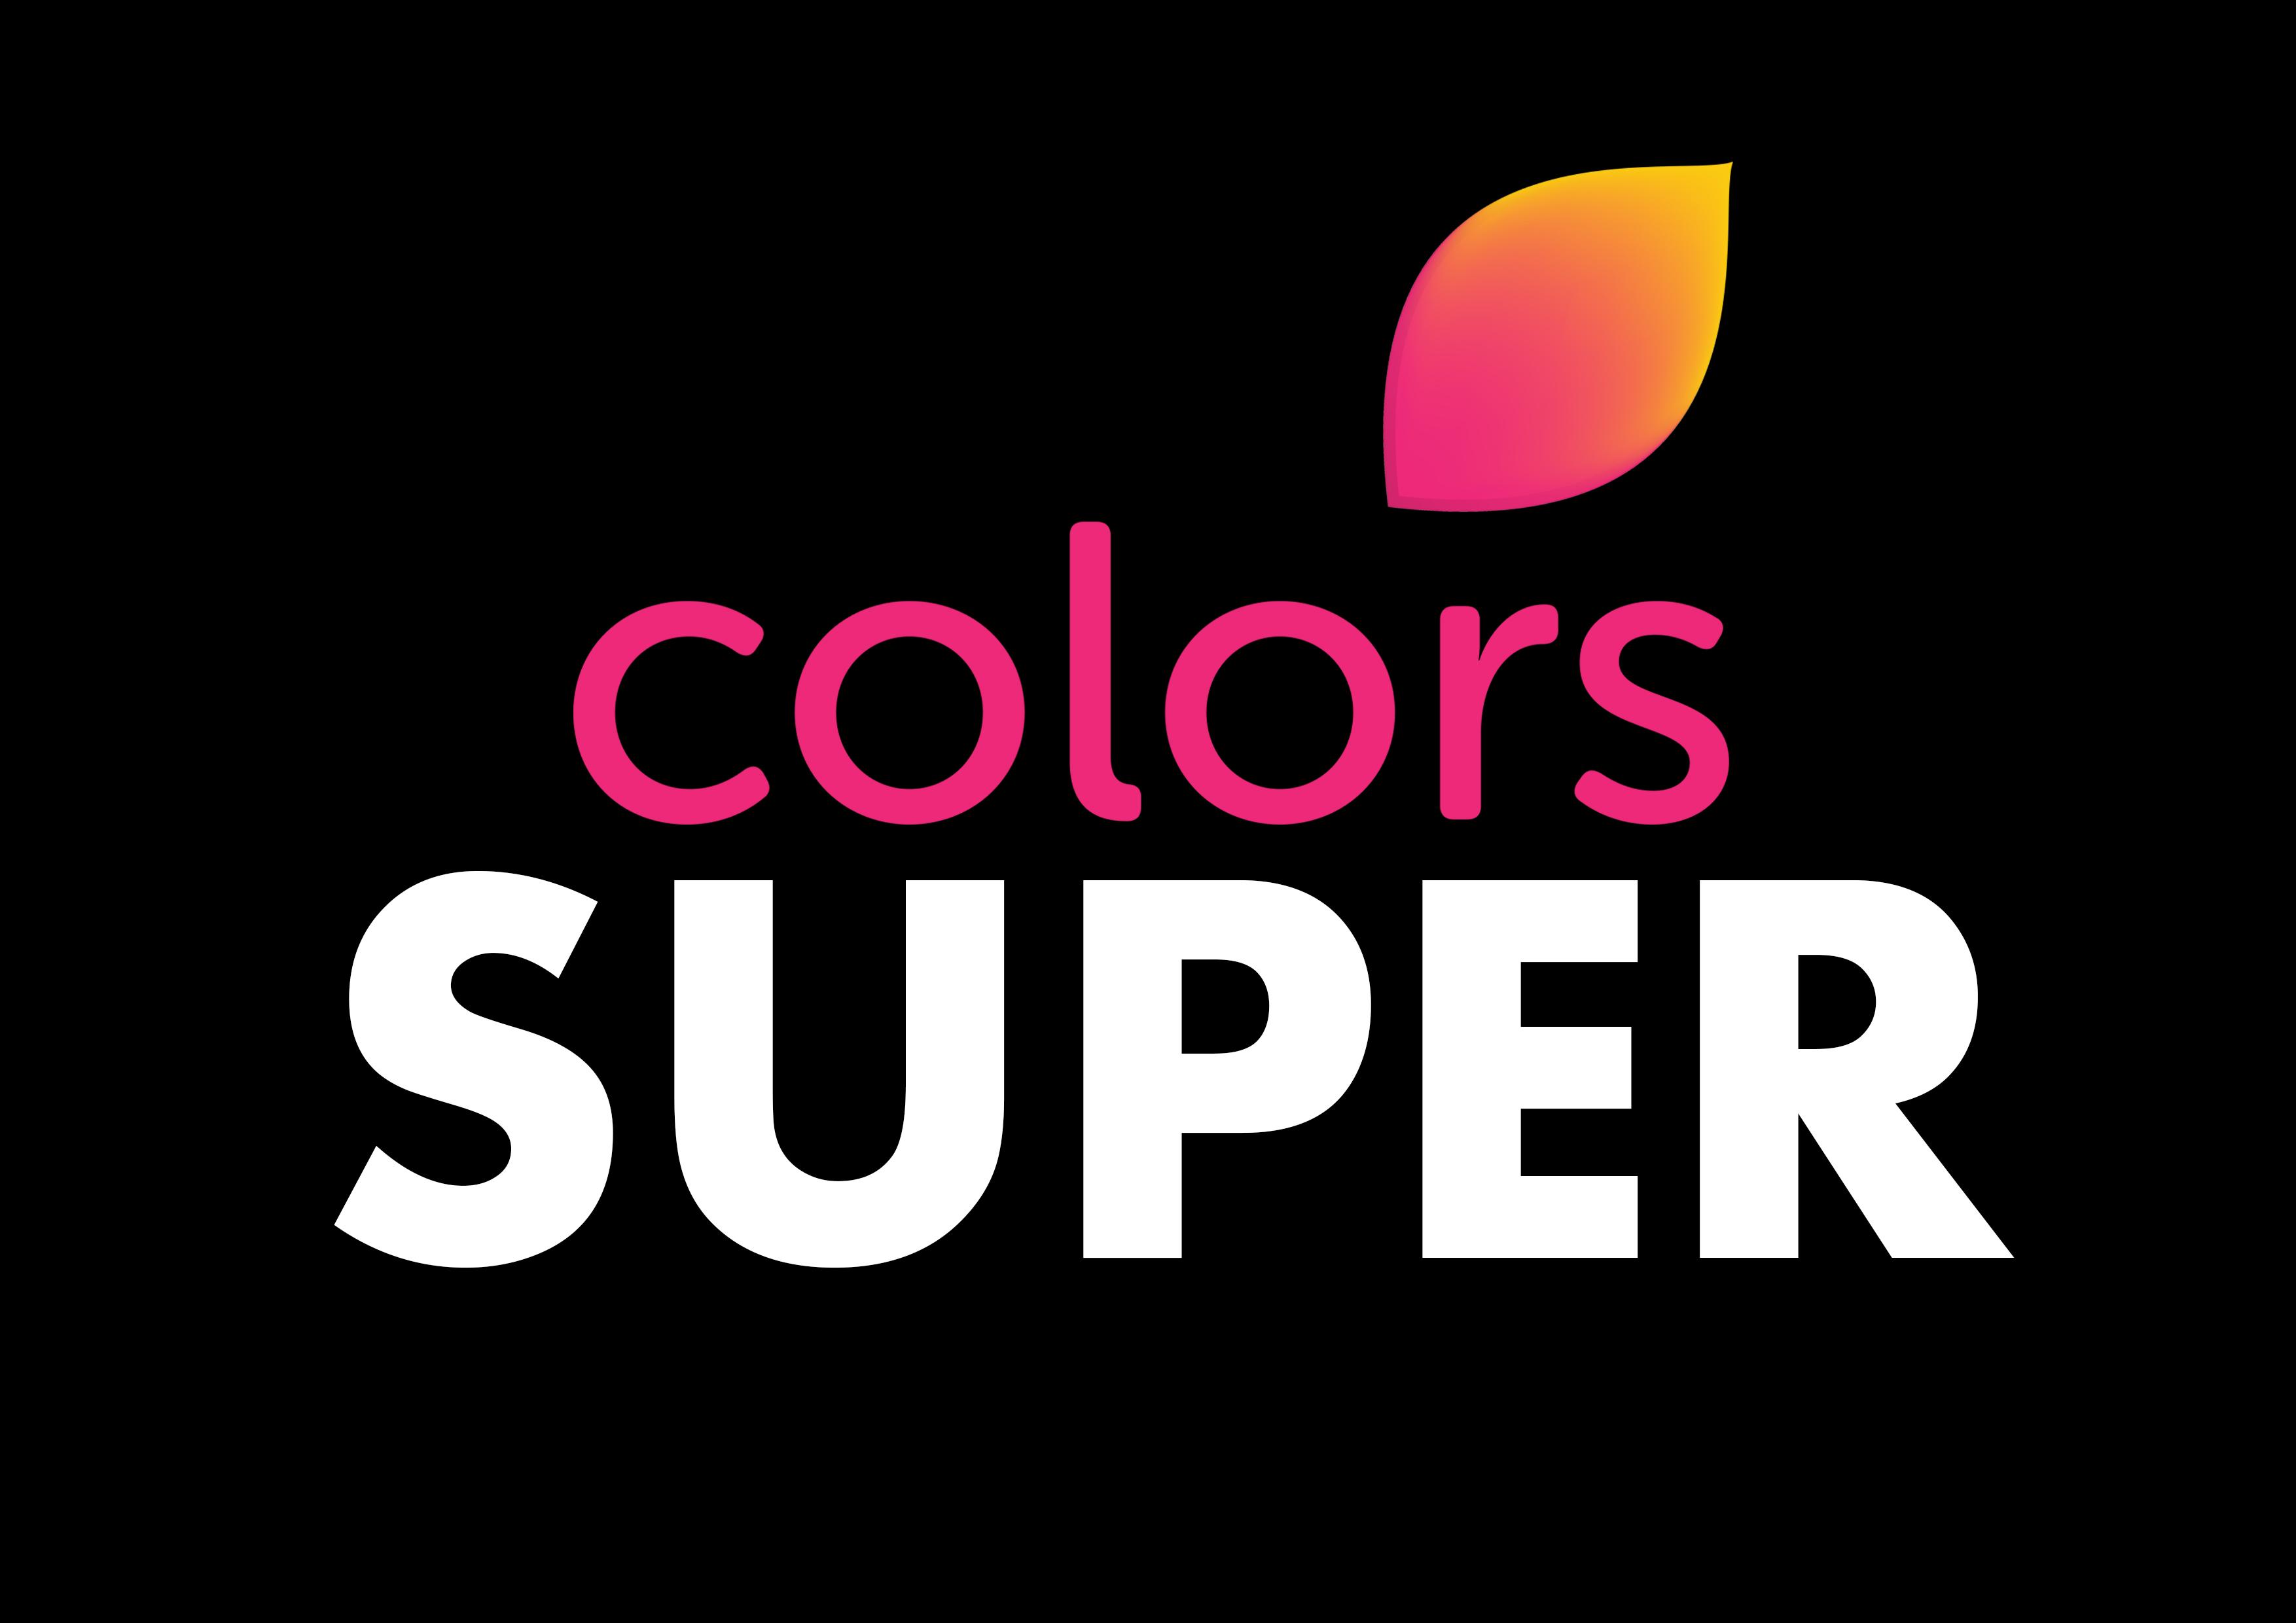 Colors Tv Logo